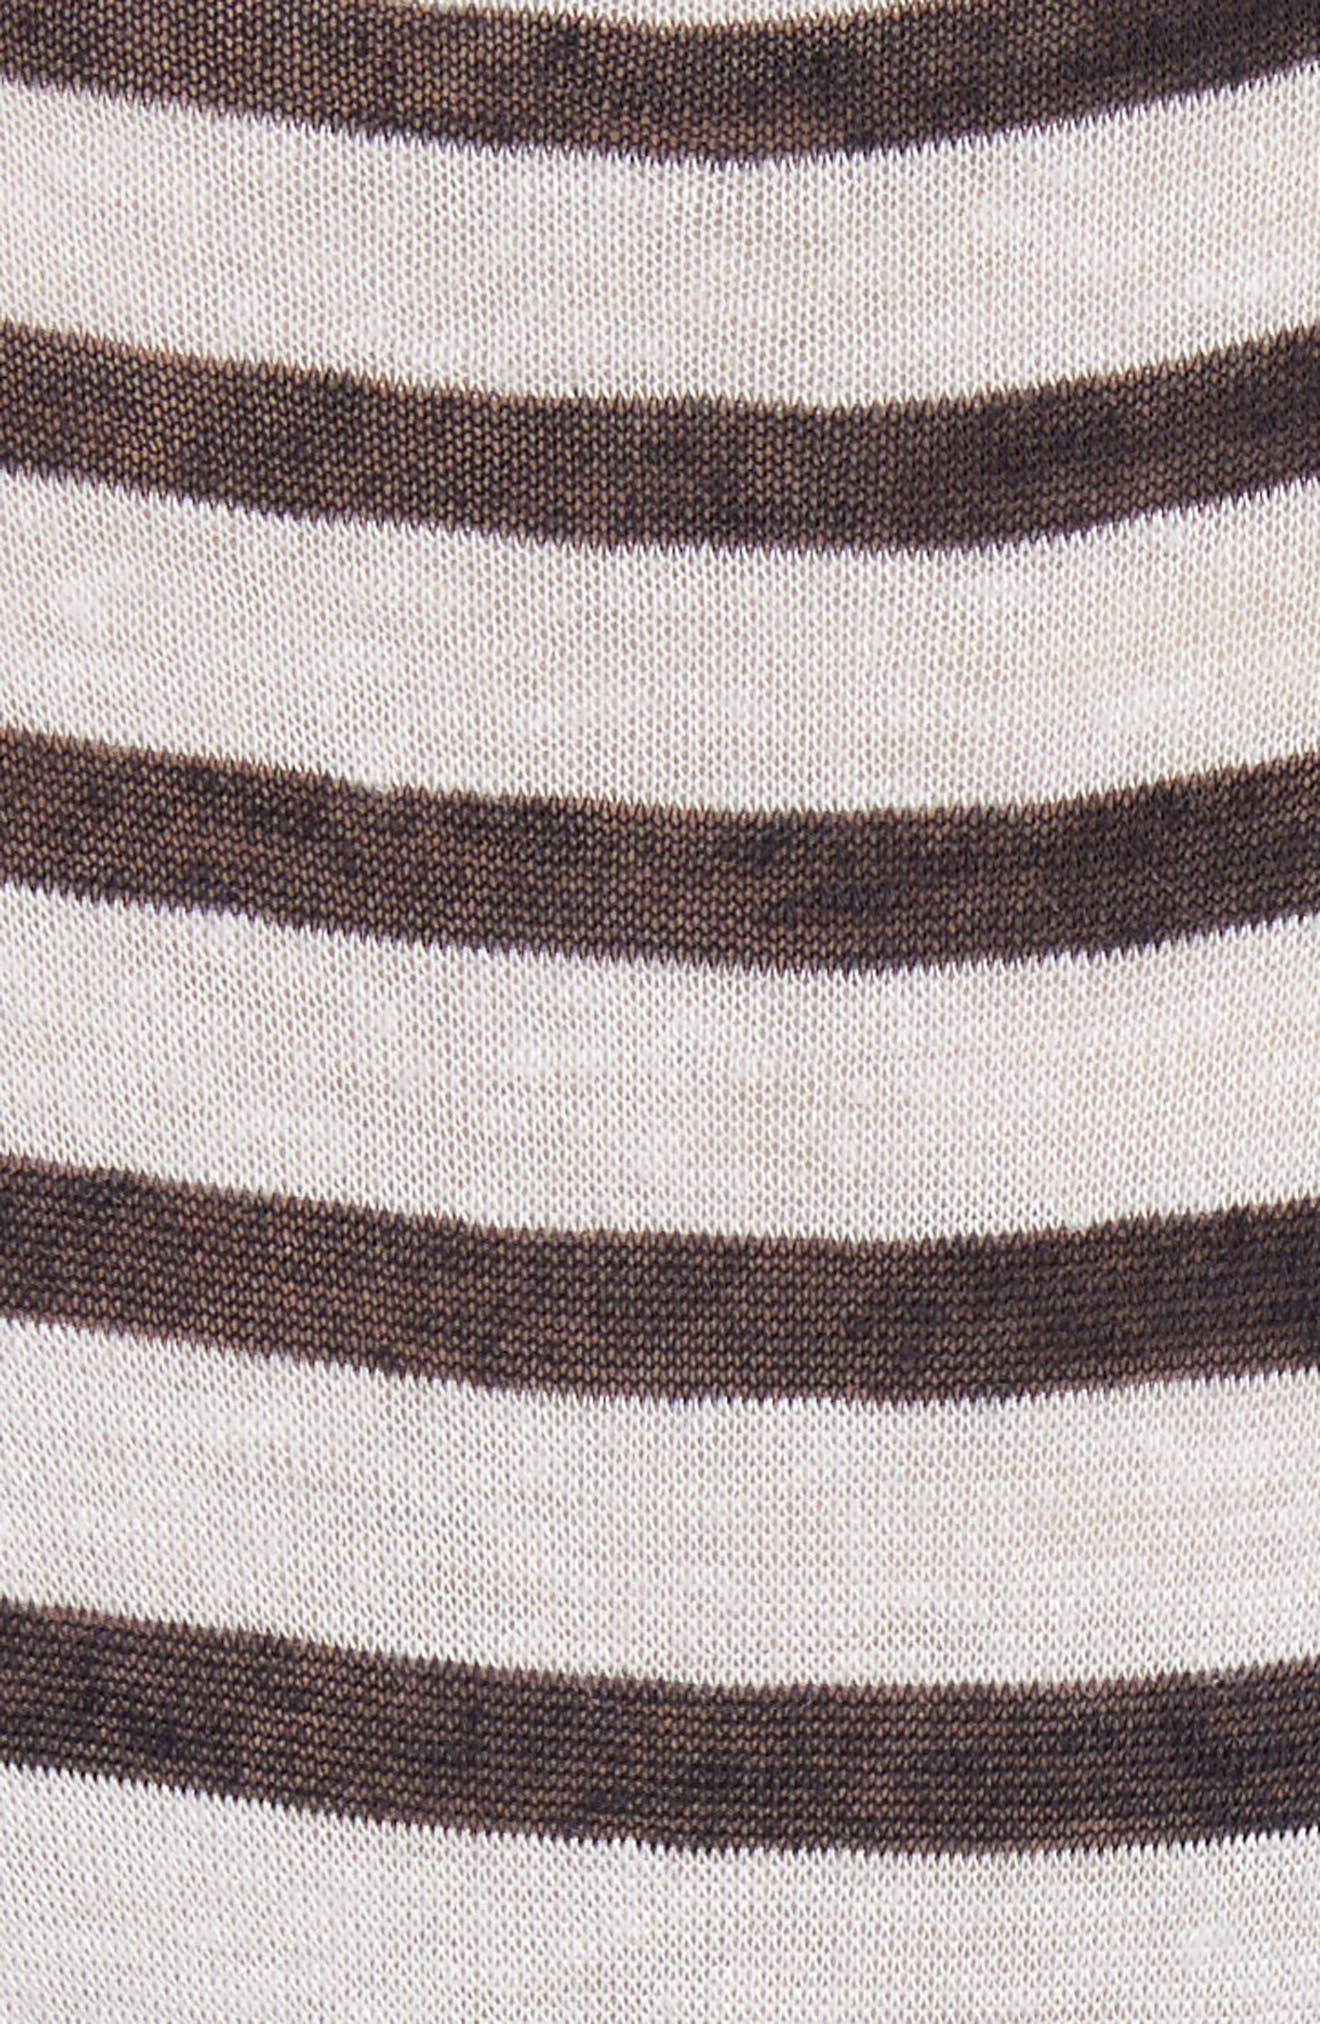 Back Tie Stripe Slub Jersey Tee,                             Alternate thumbnail 5, color,                             Ivory/ Ink Stripe